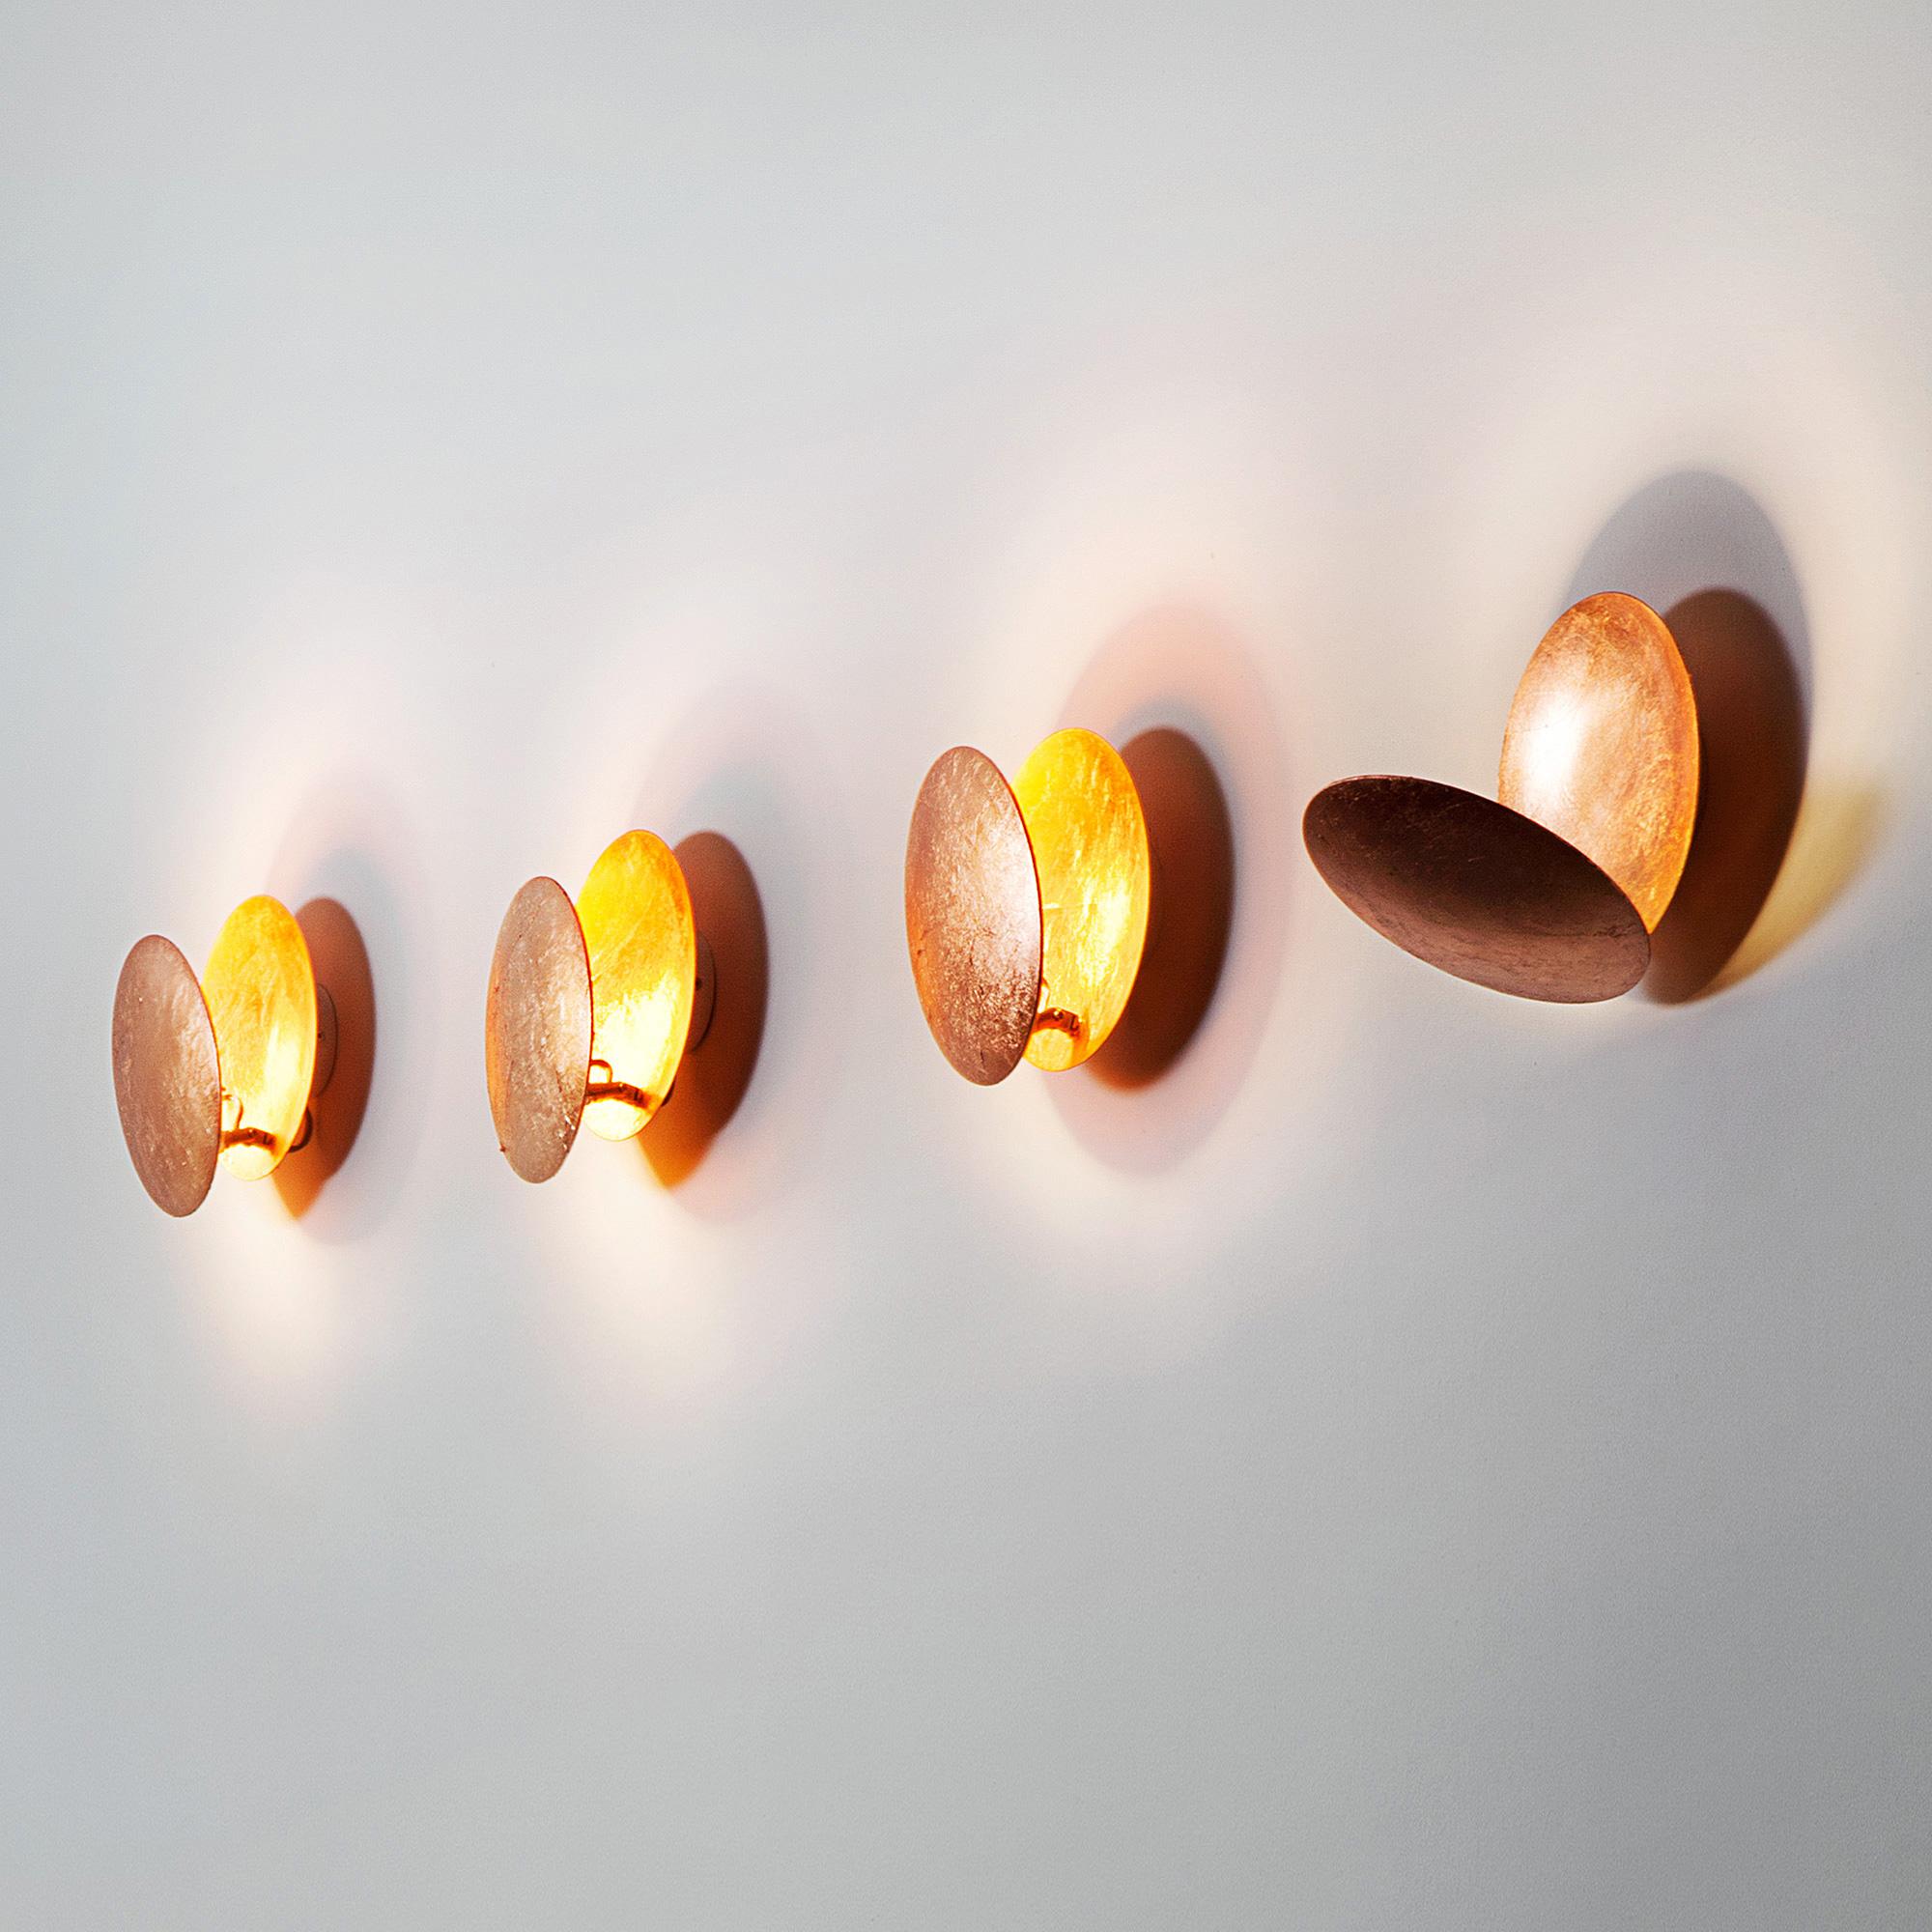 catellani smith lederam w led wandleuchten gold lw17402 reuter onlineshop. Black Bedroom Furniture Sets. Home Design Ideas